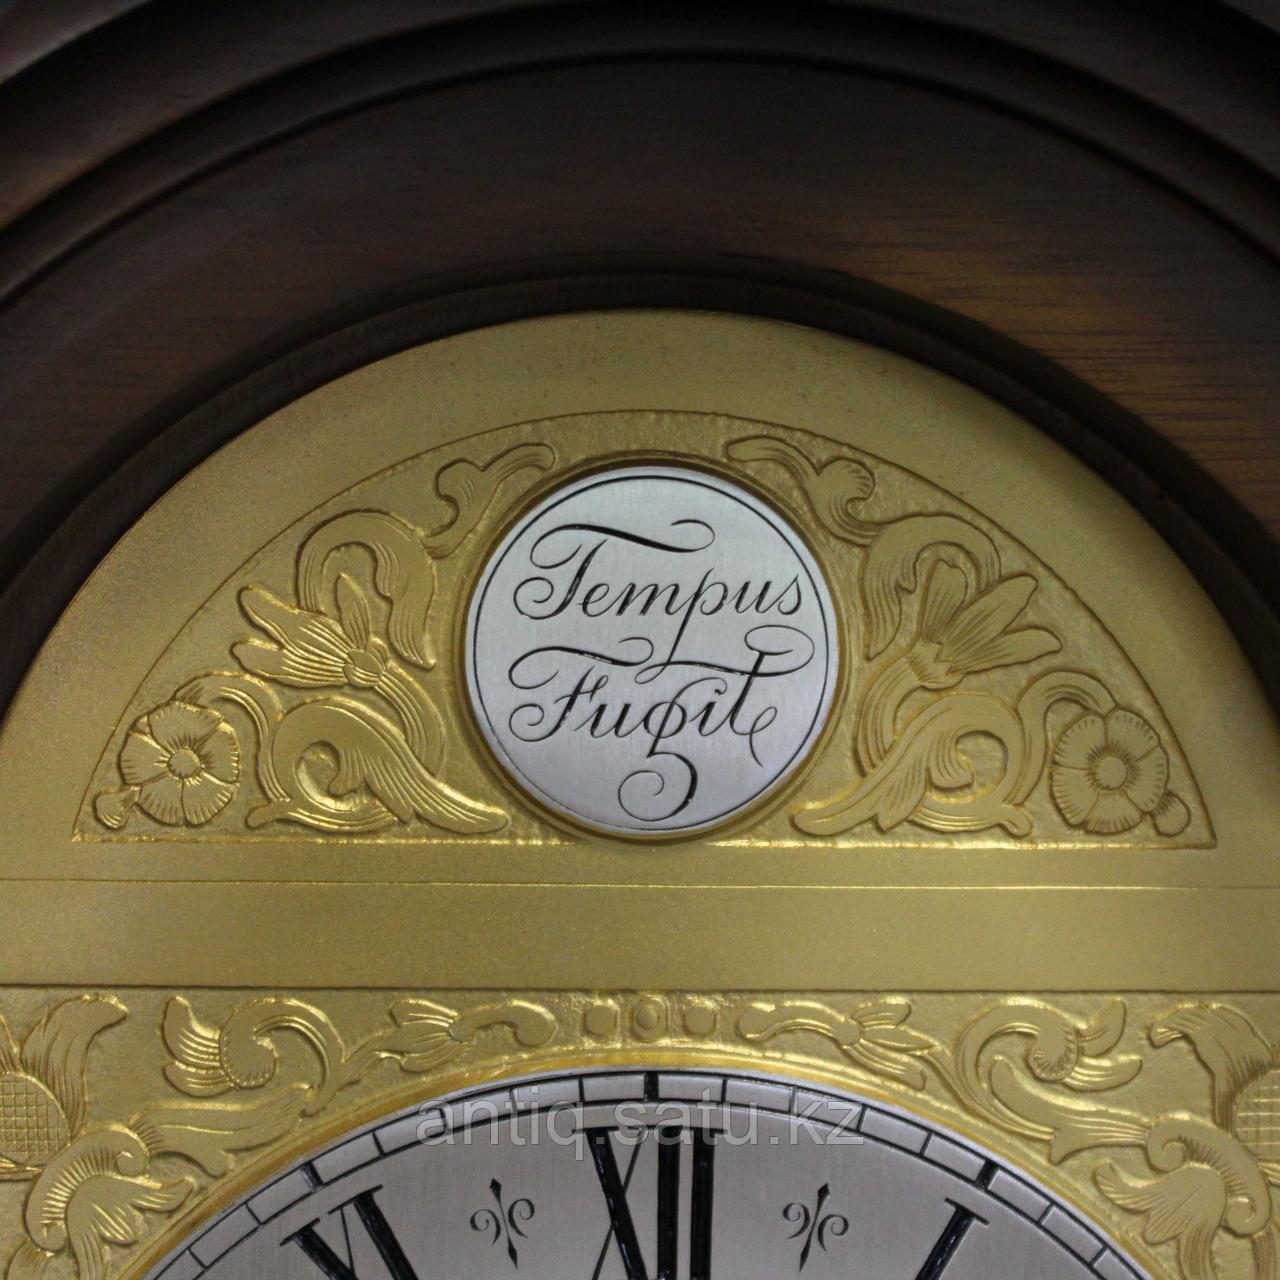 Настольные часы Часовая мастерская Emil Schmeckenbecher - фото 4